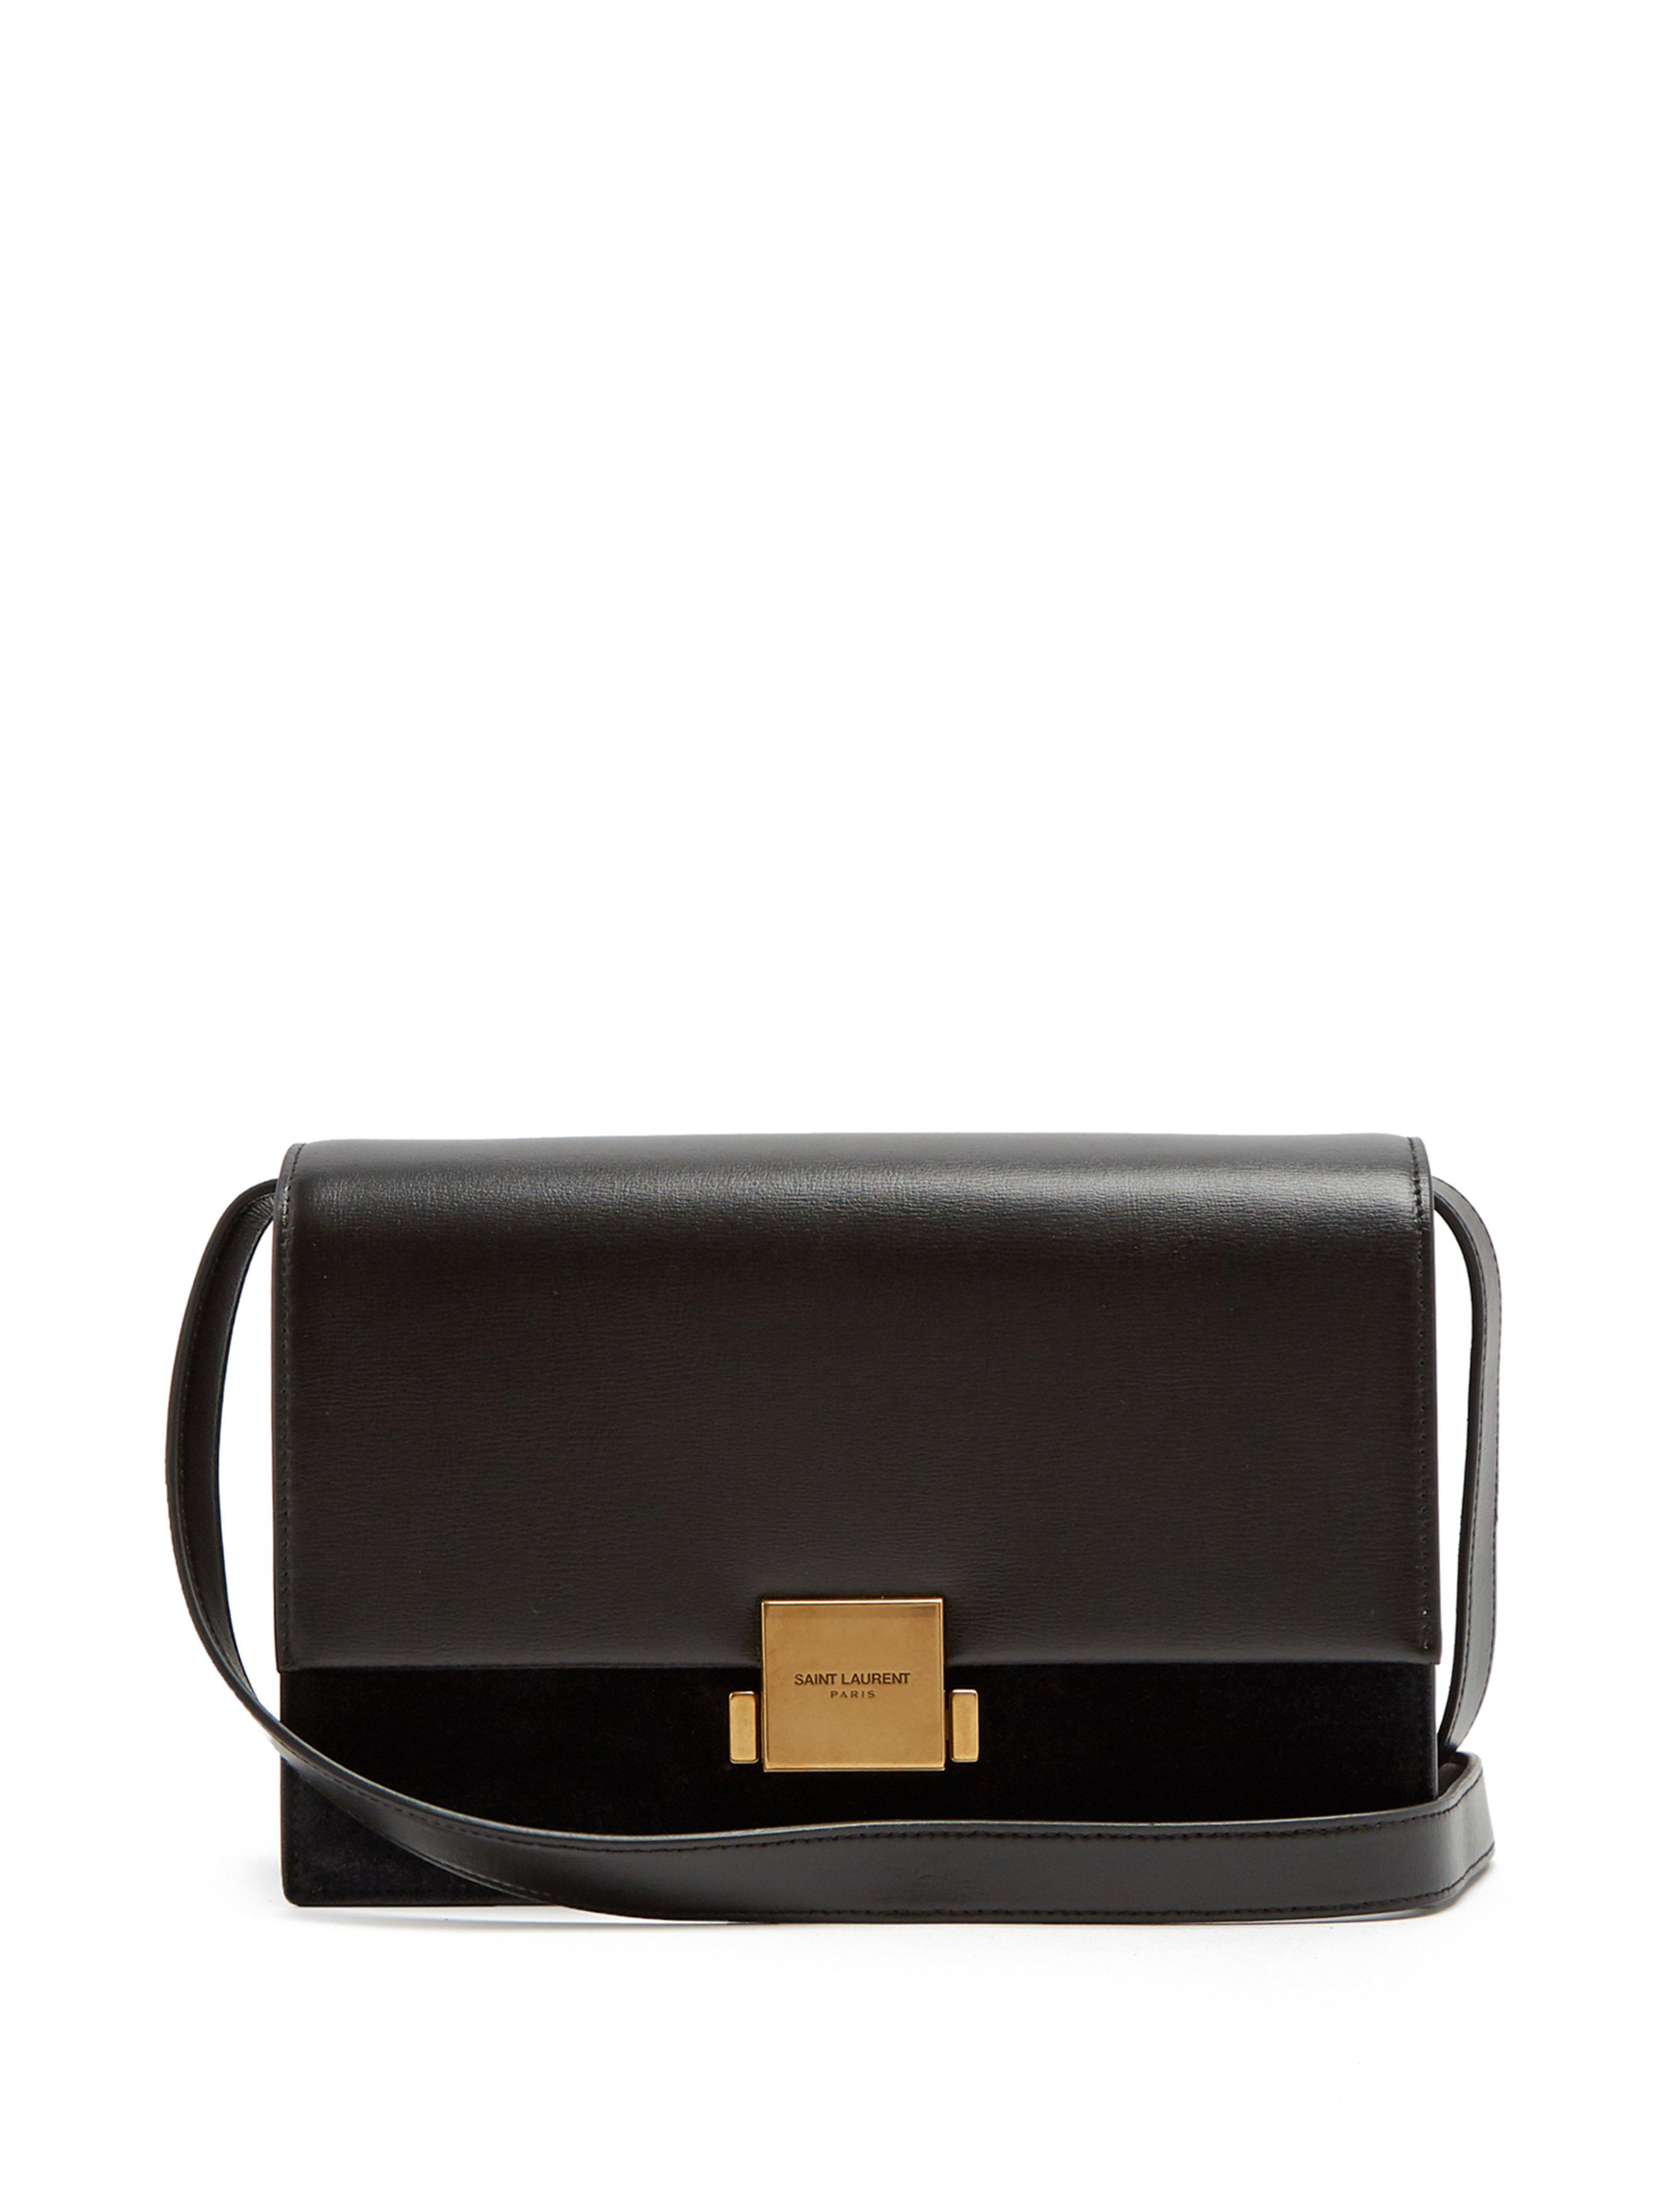 0ca230c12cac Saint Laurent. Women s Black Bellechasse Medium Leather And Suede Bag